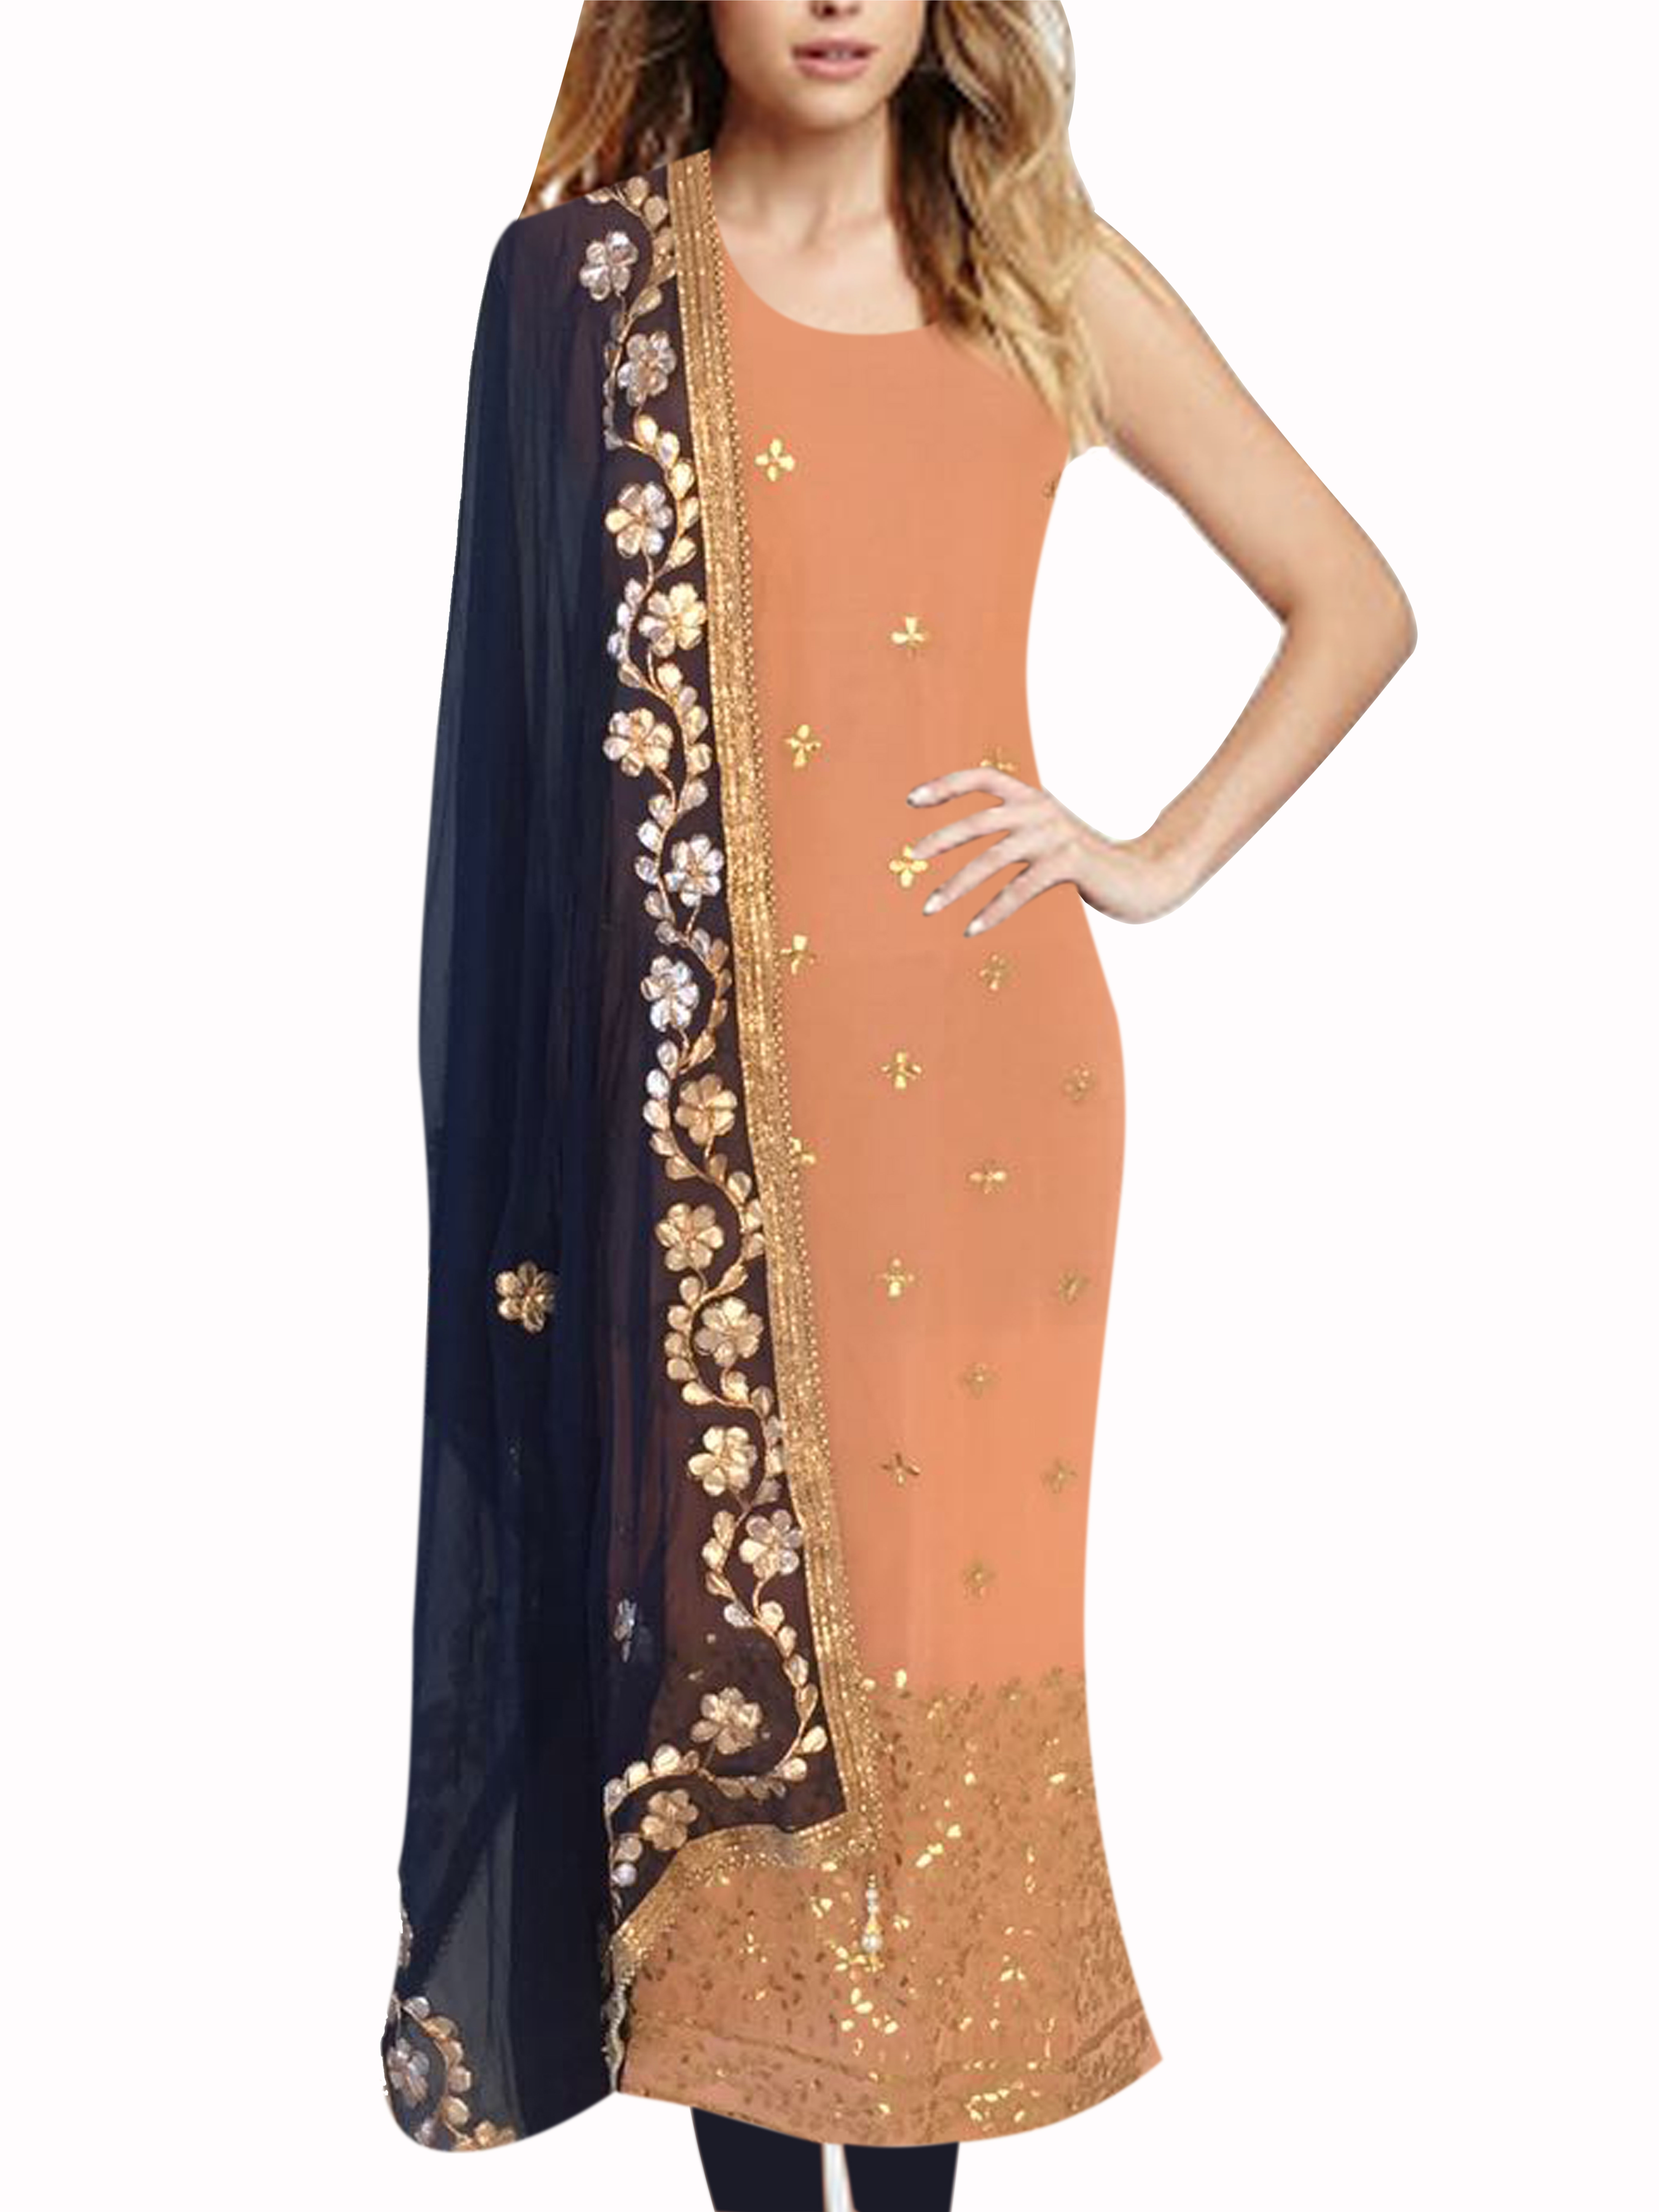 6df9c60748446 Pumpkin daman unstitched kurti with navy blue gota patti dupatta - Design  Sanjoli - 2482388